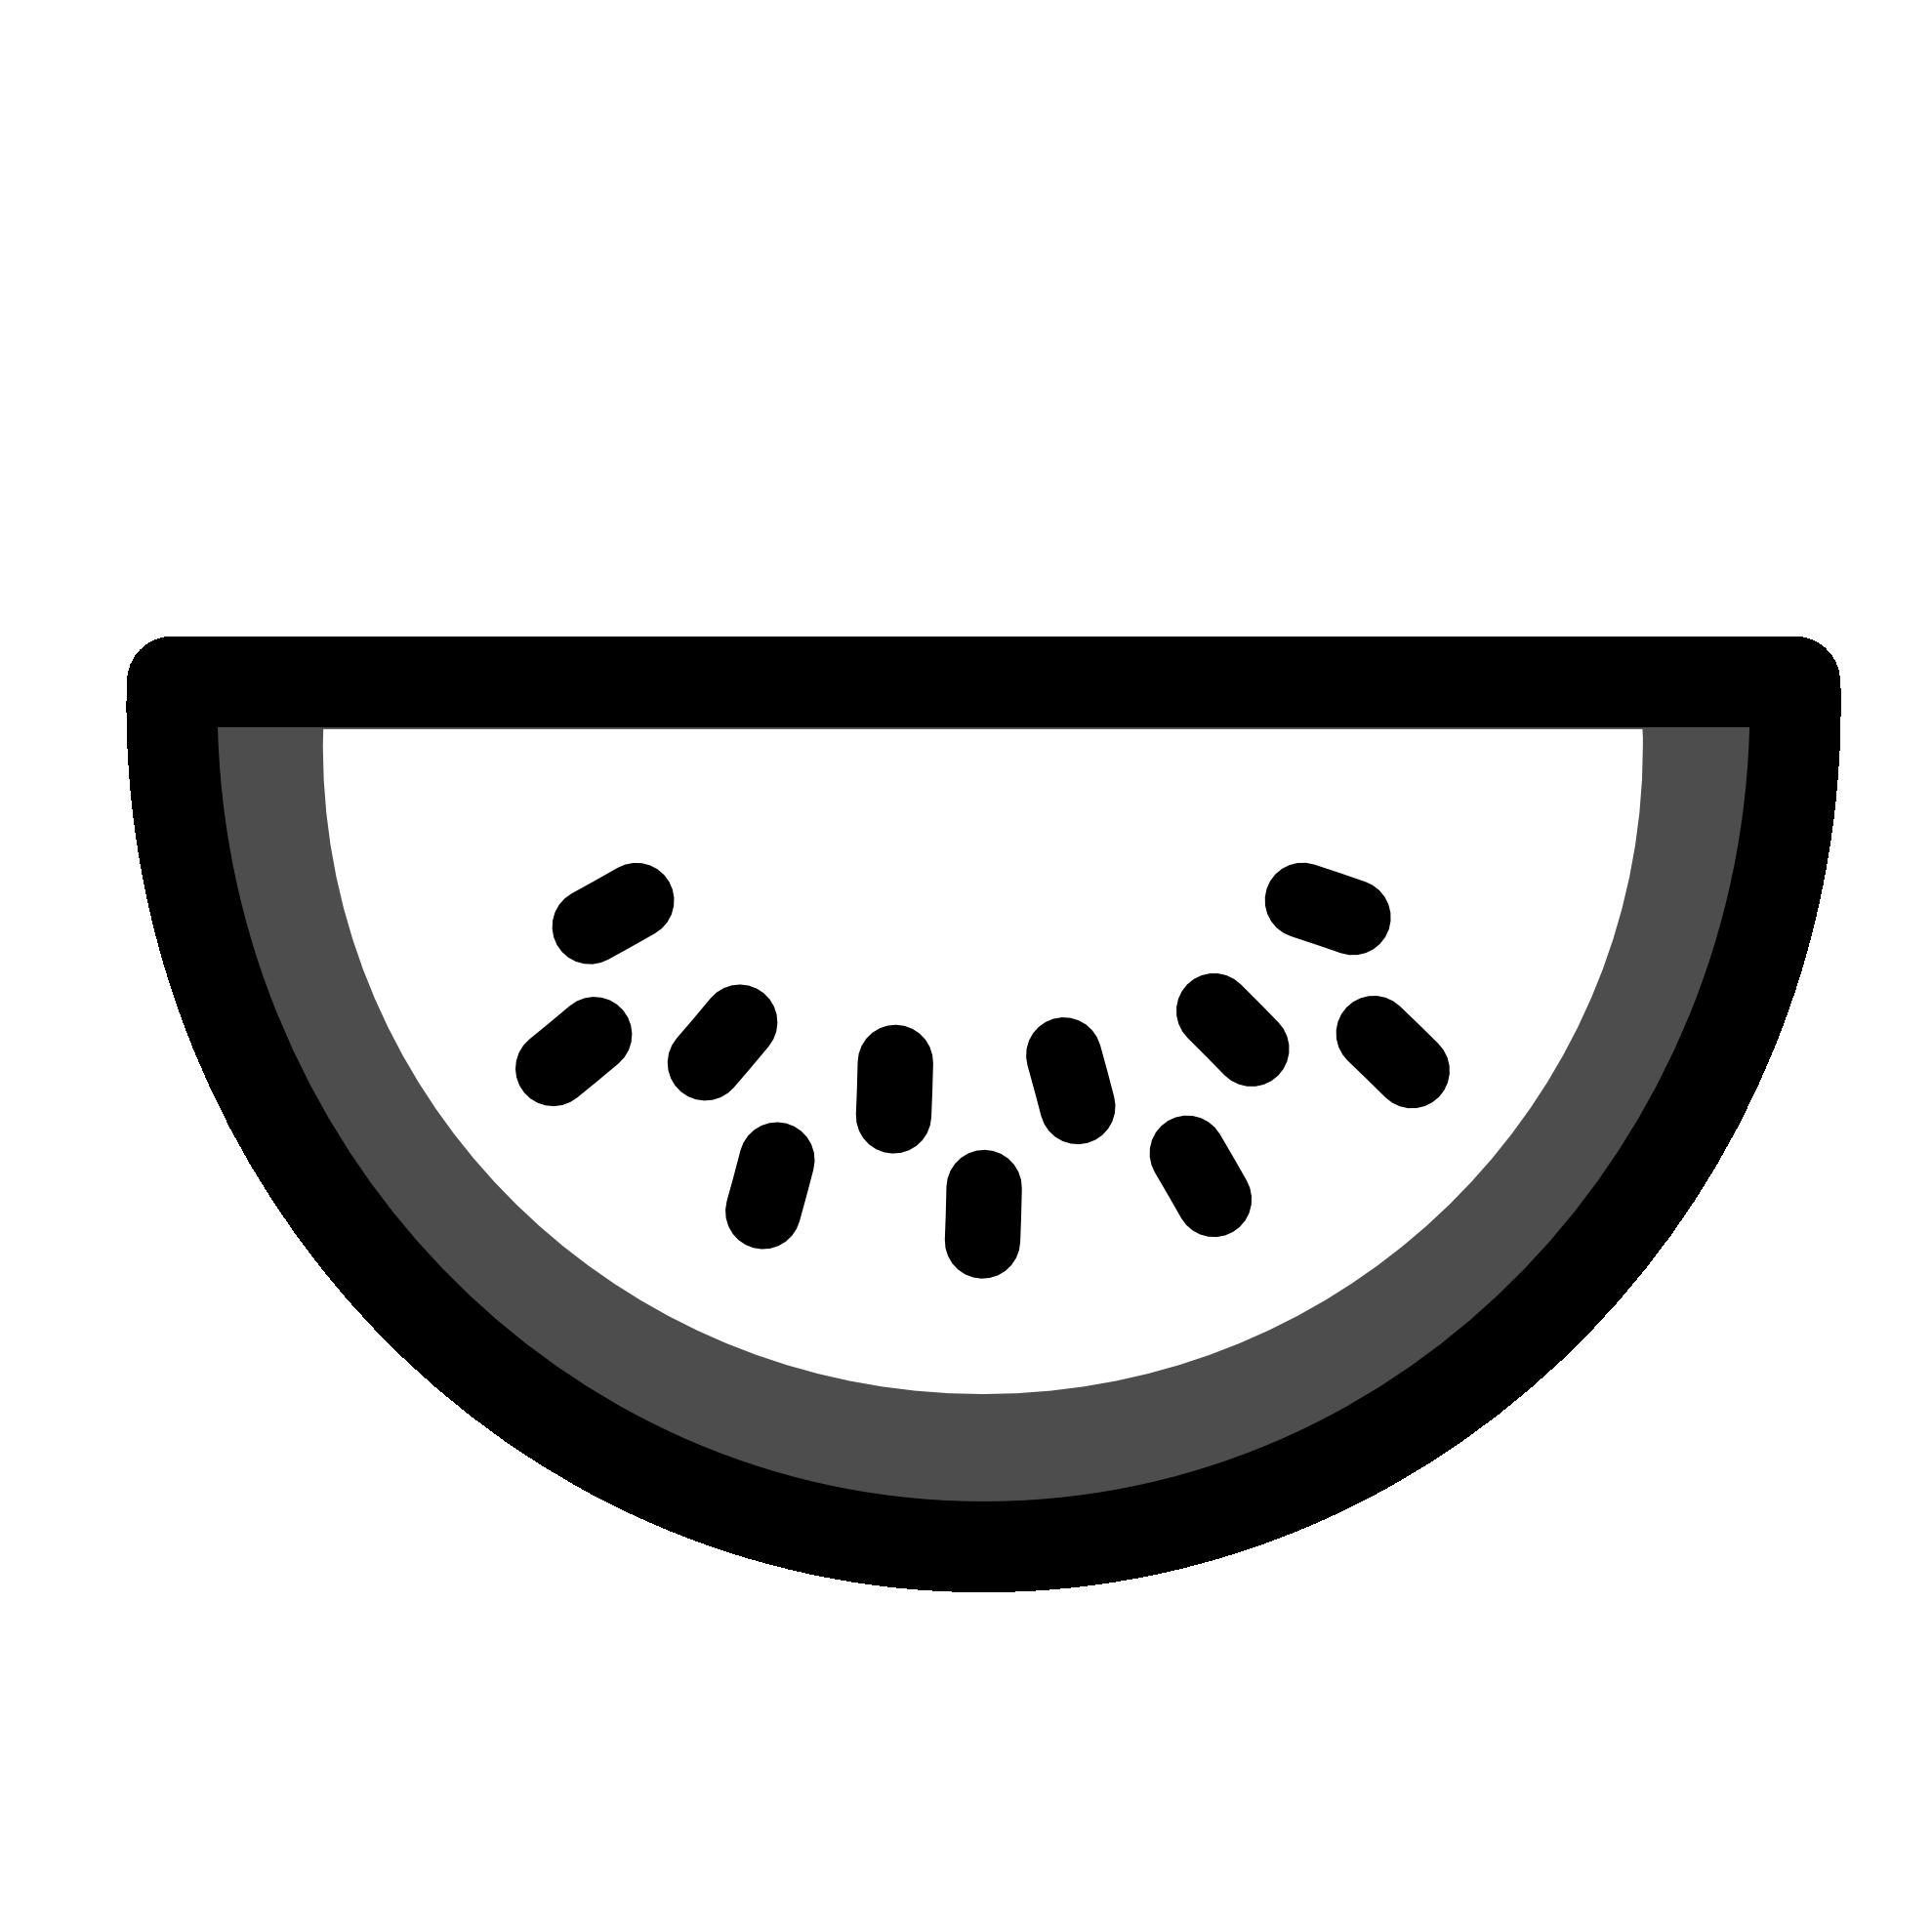 Black And White Watermelon Clipart.